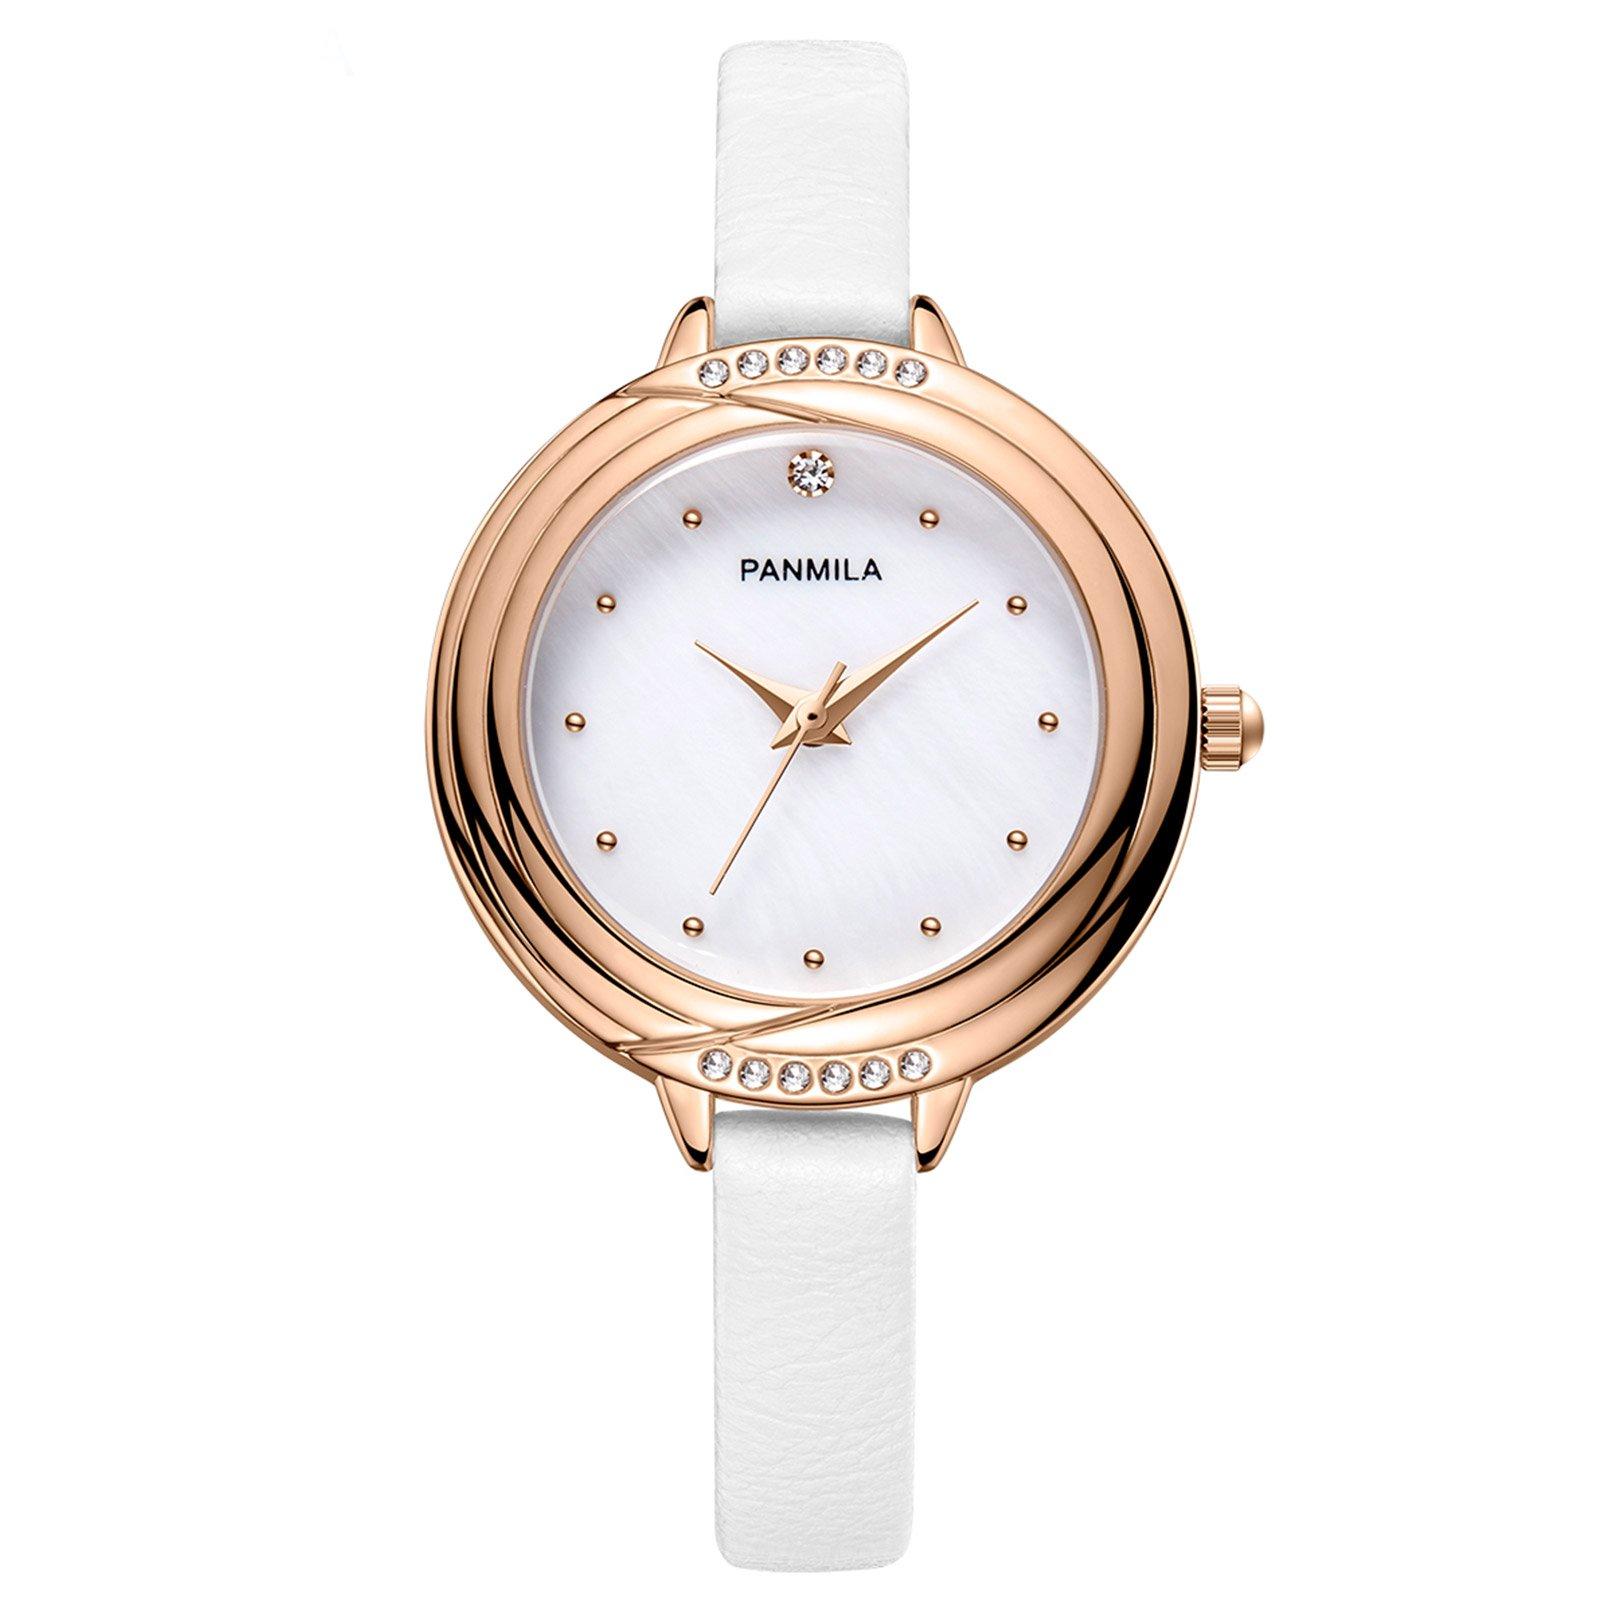 Rose-Gold-Wrist-Watch-for-Women-Ladies-Girls-Crystal-White-Dial-Quartz-Watch